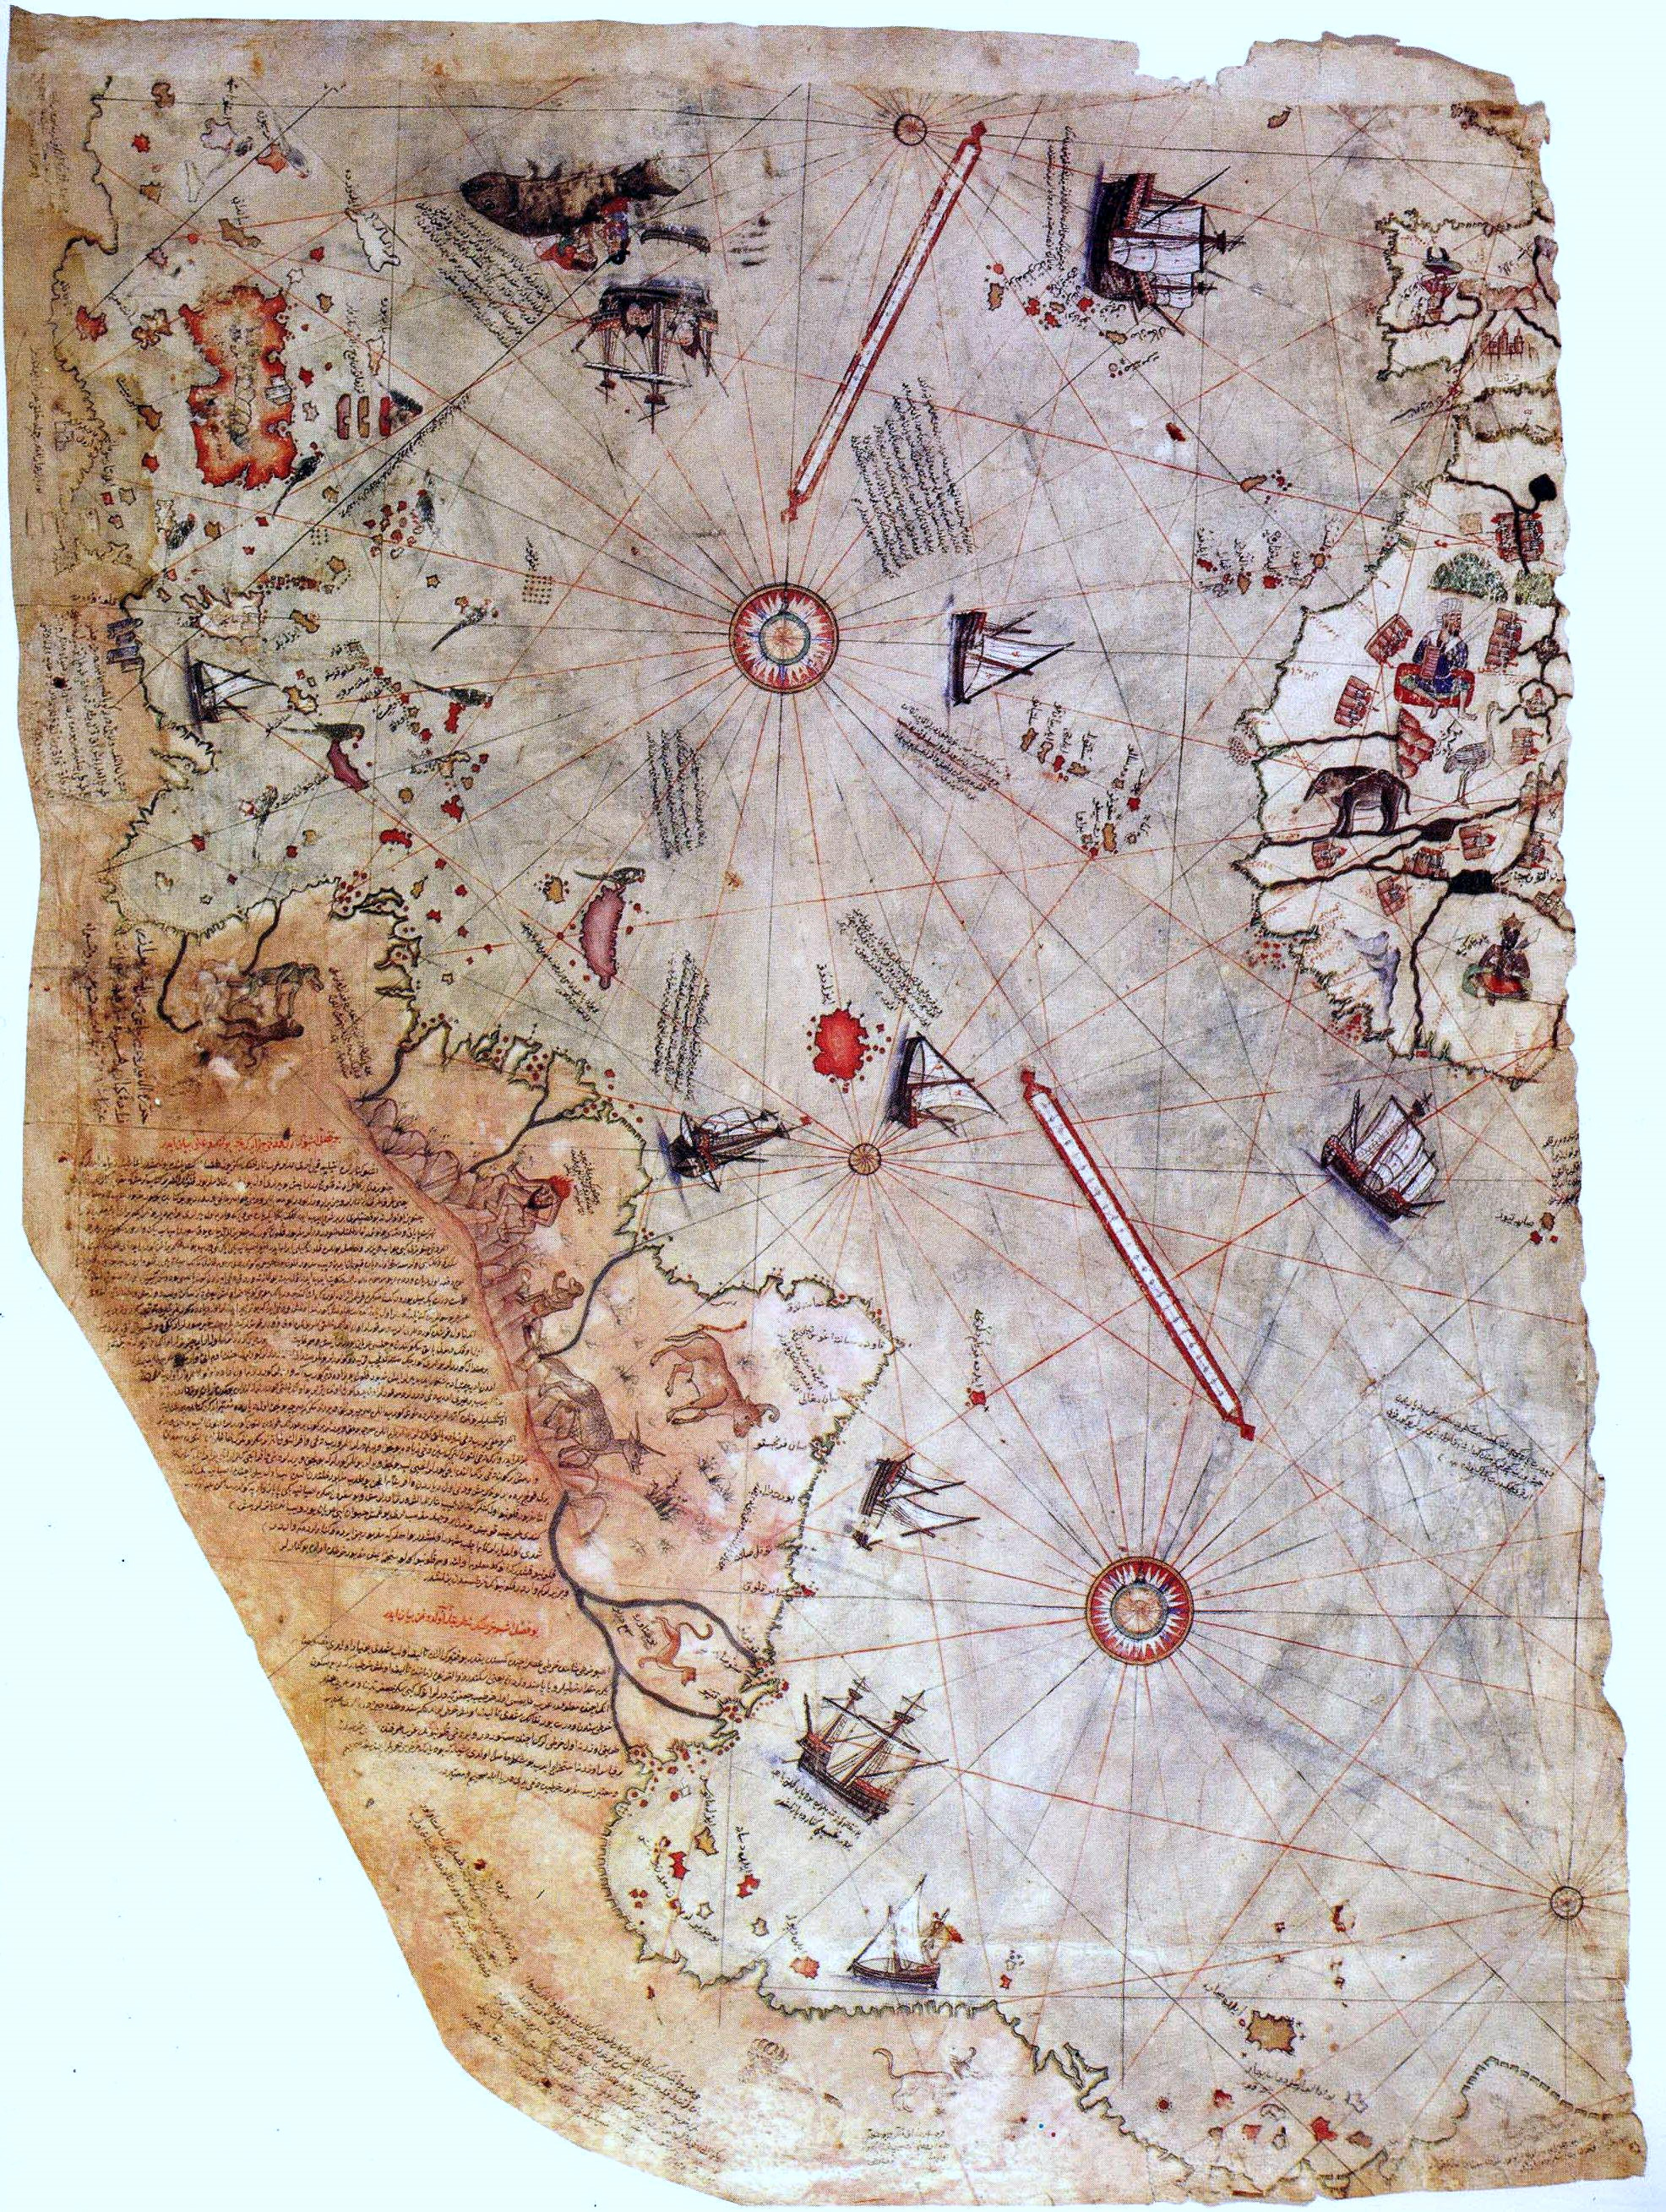 Oldest Known World Map.Piri Reis A Genius 16th Century Ottoman Cartographer And Navigator